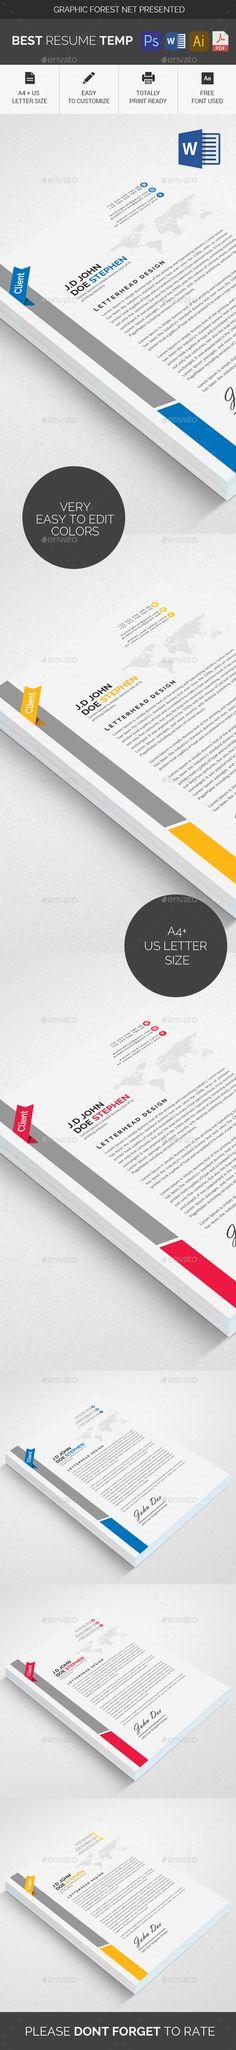 letter format on letterhead%0A Corporate Letterhead  Stationery Templates   Stationery Templates    Pinterest   Stationery templates and Template